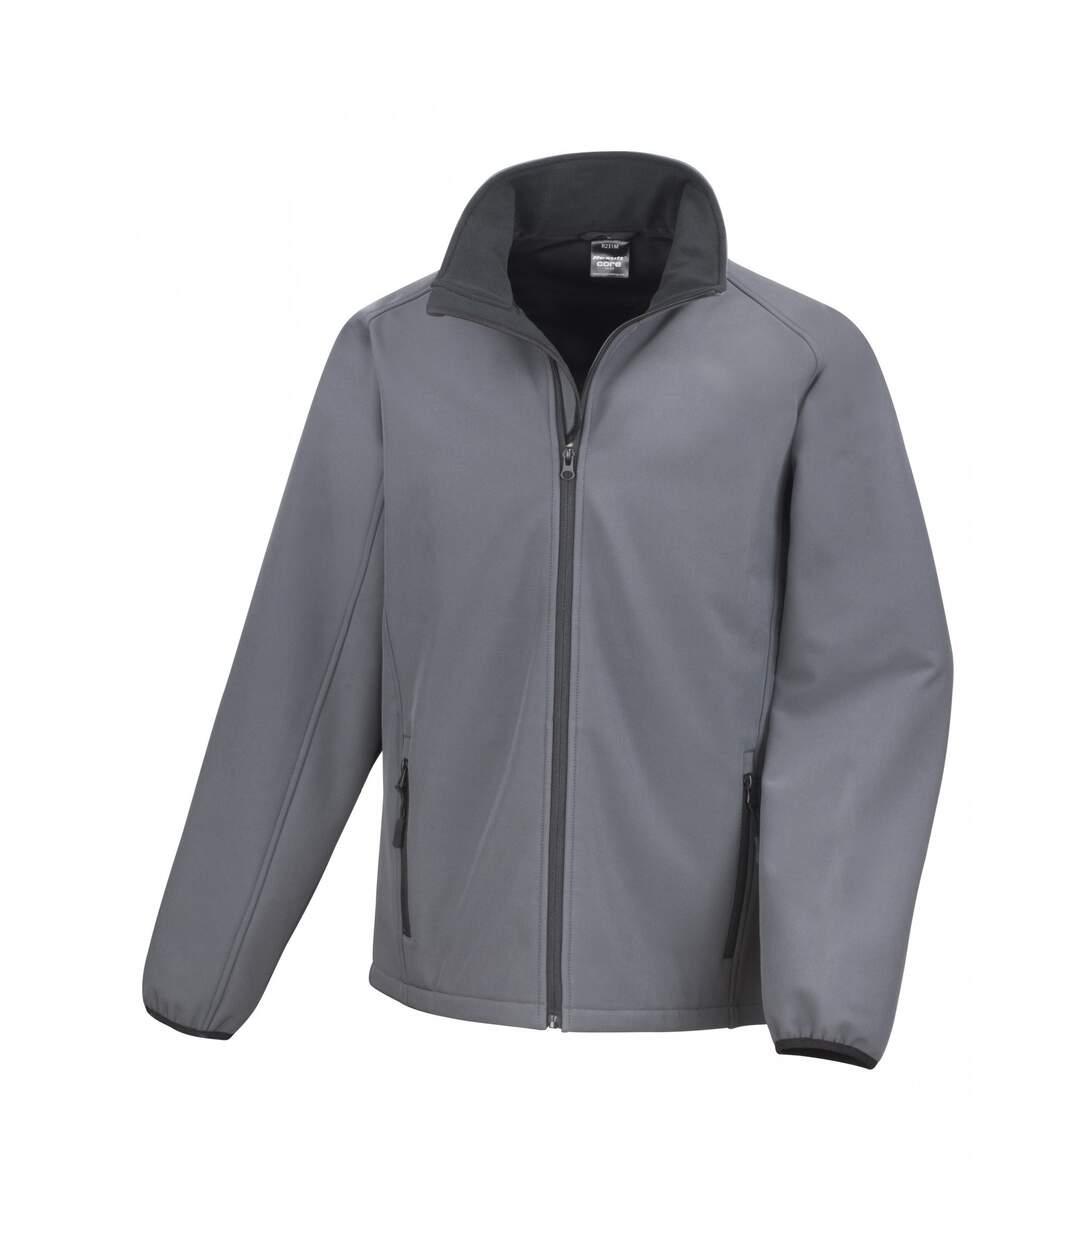 Result Mens Core Printable Softshell Jacket (Black / Black) - UTRW3697